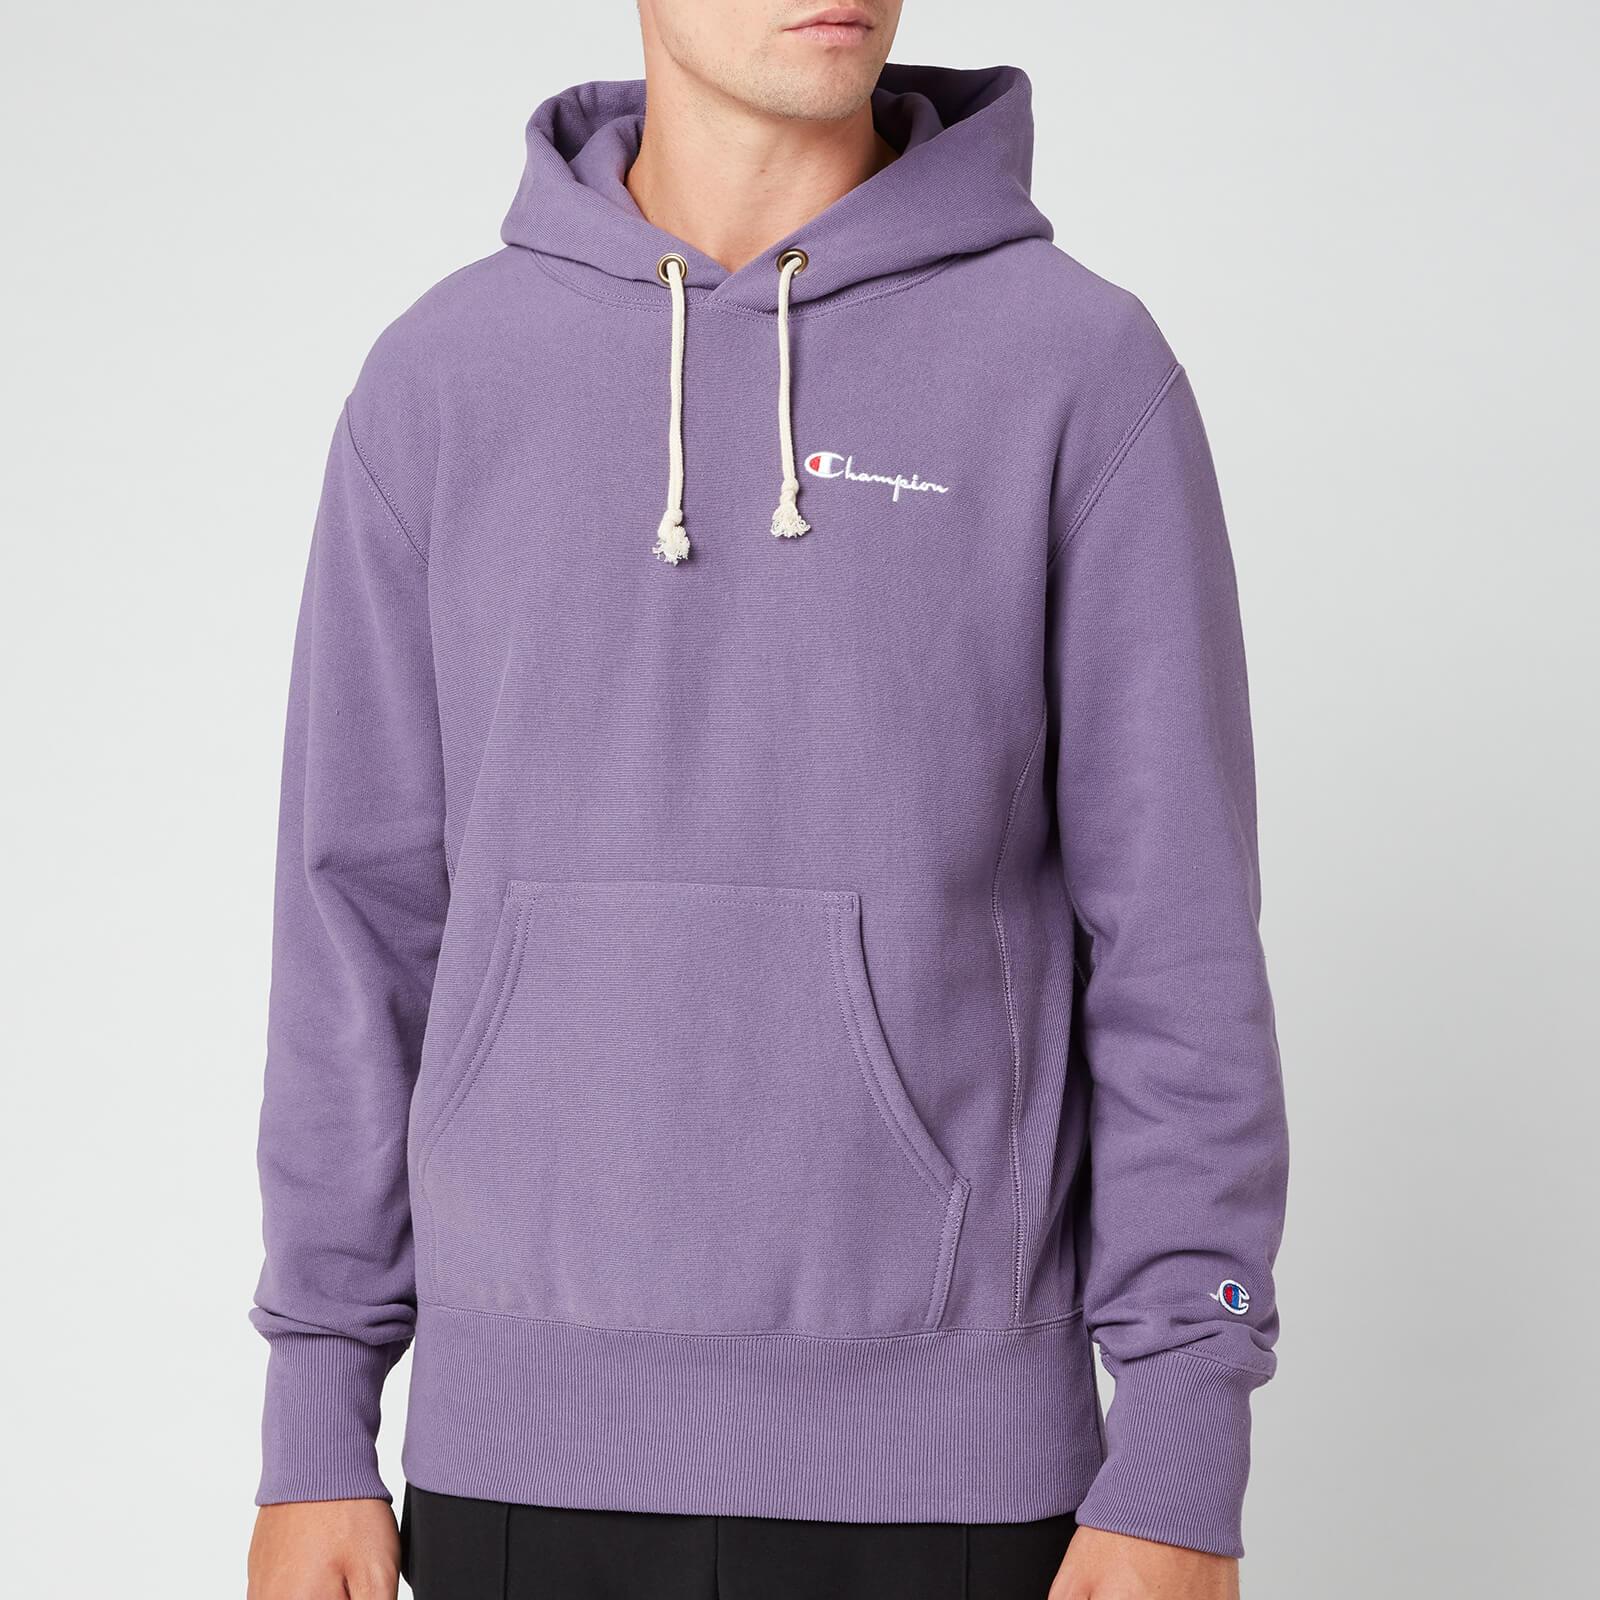 Champion Men's Small Script Hooded Sweatshirt - Purple - M